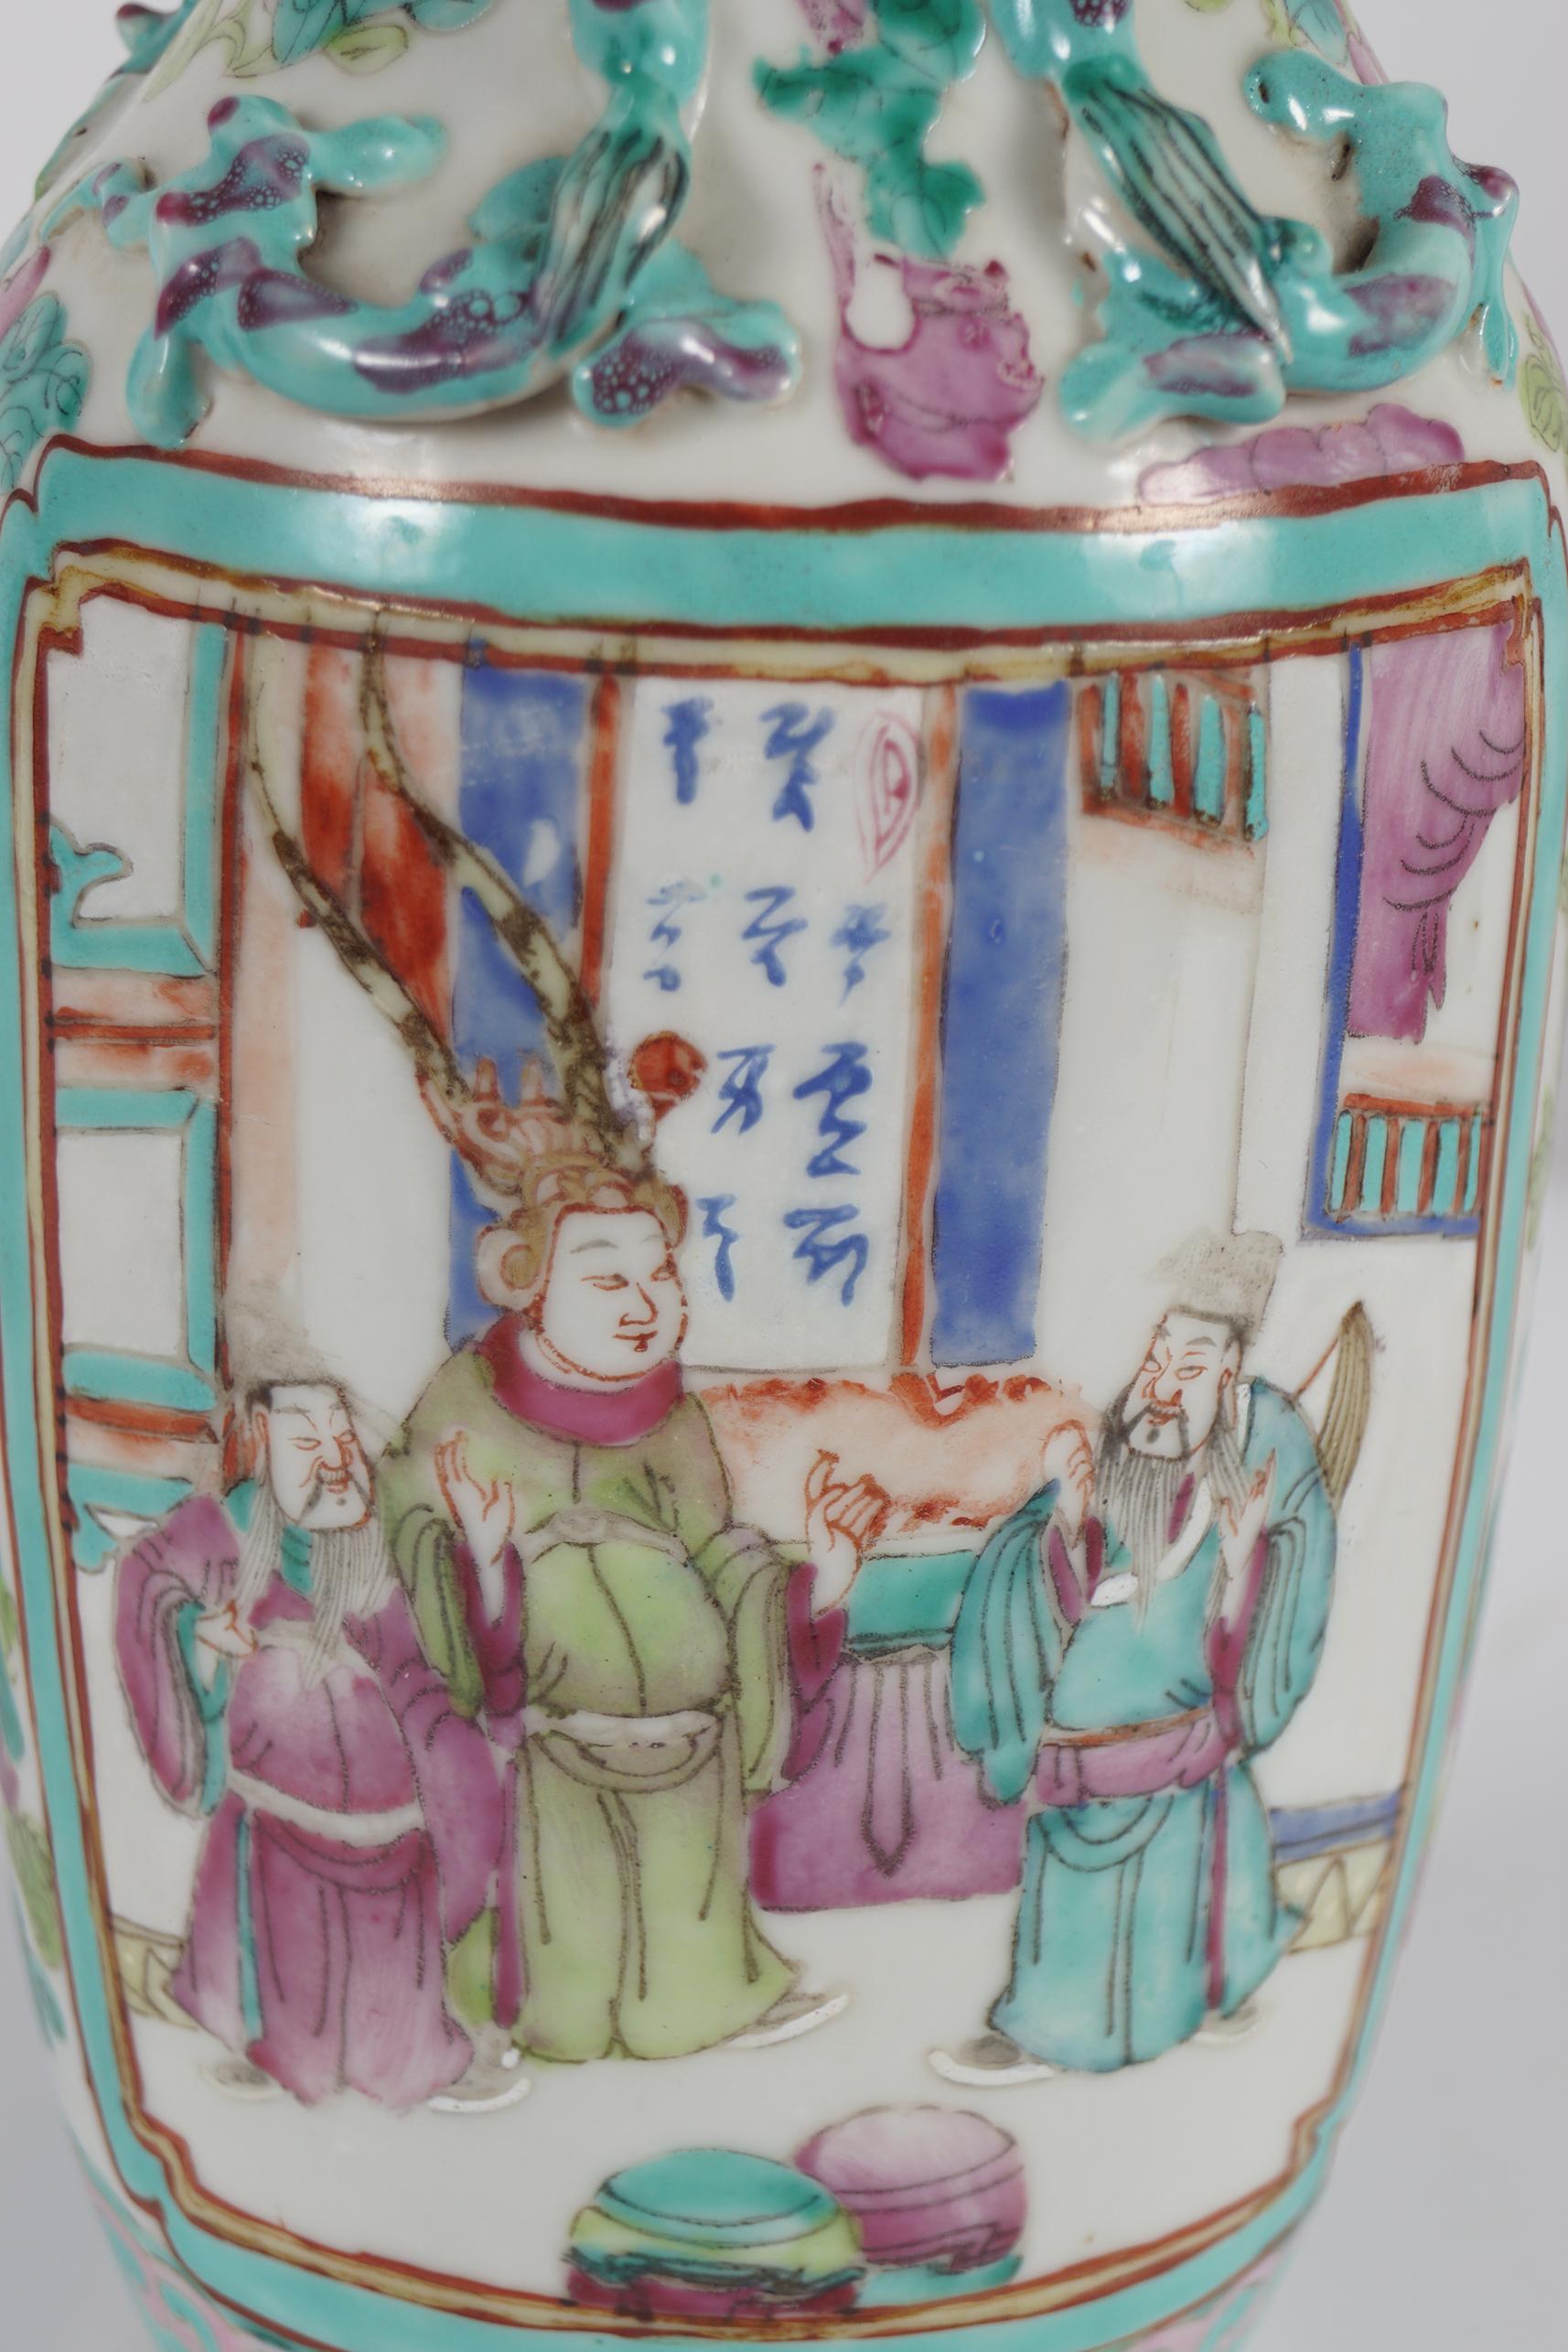 19TH-CENTURY CHINESE FAMILLE ROSE VASE - Image 3 of 4